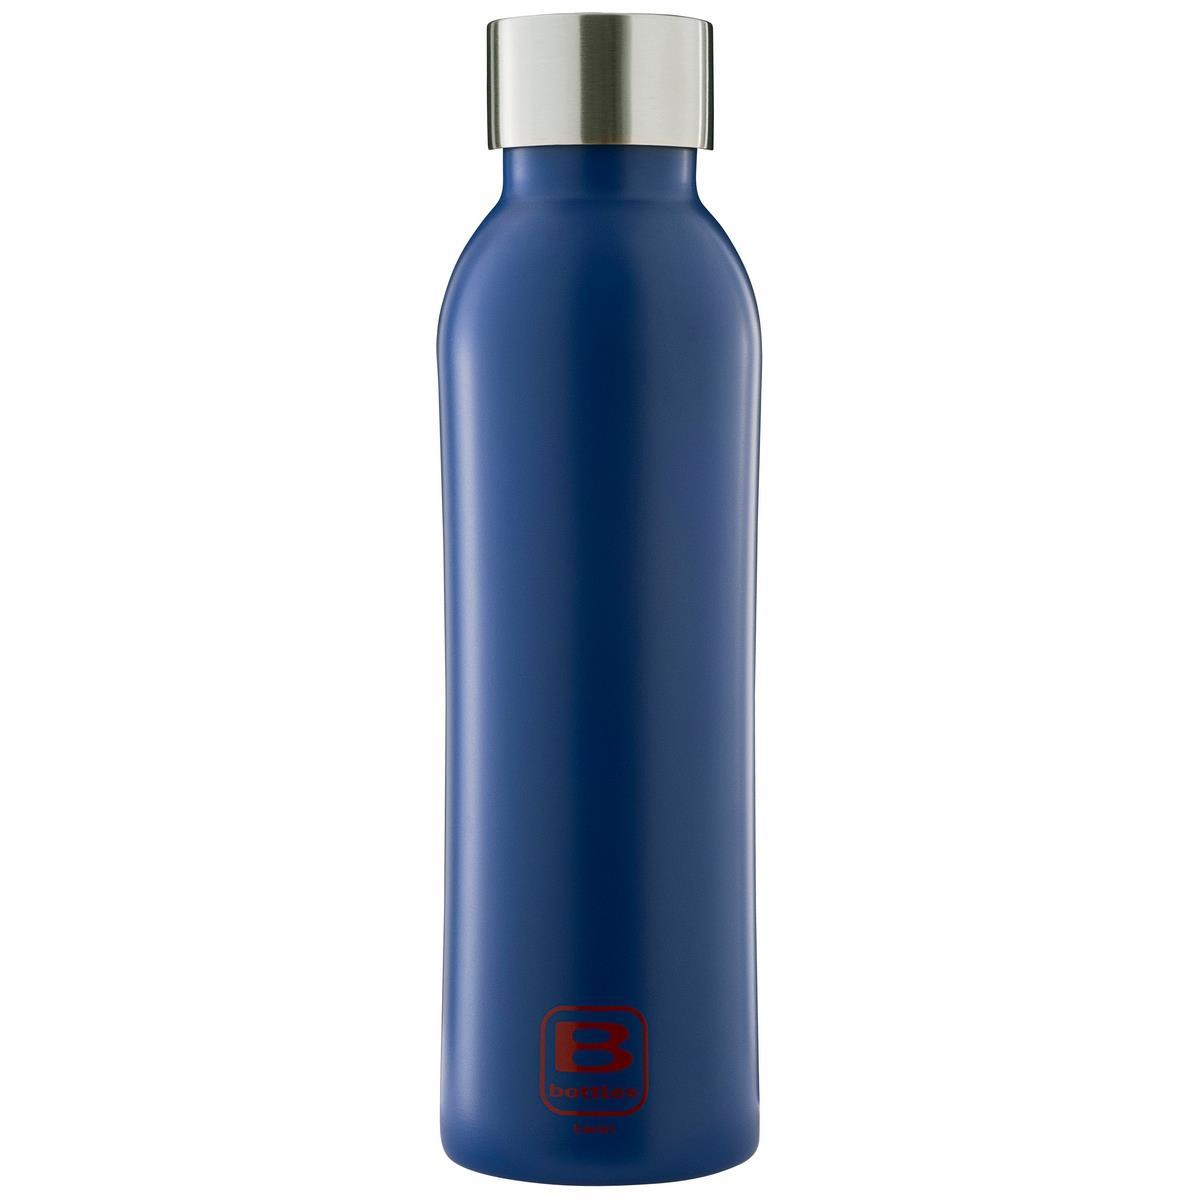 B Bottles Twin - Classic Blue - 500 ml - Bottiglia Termica a doppia parete in acciaio inox 18/10